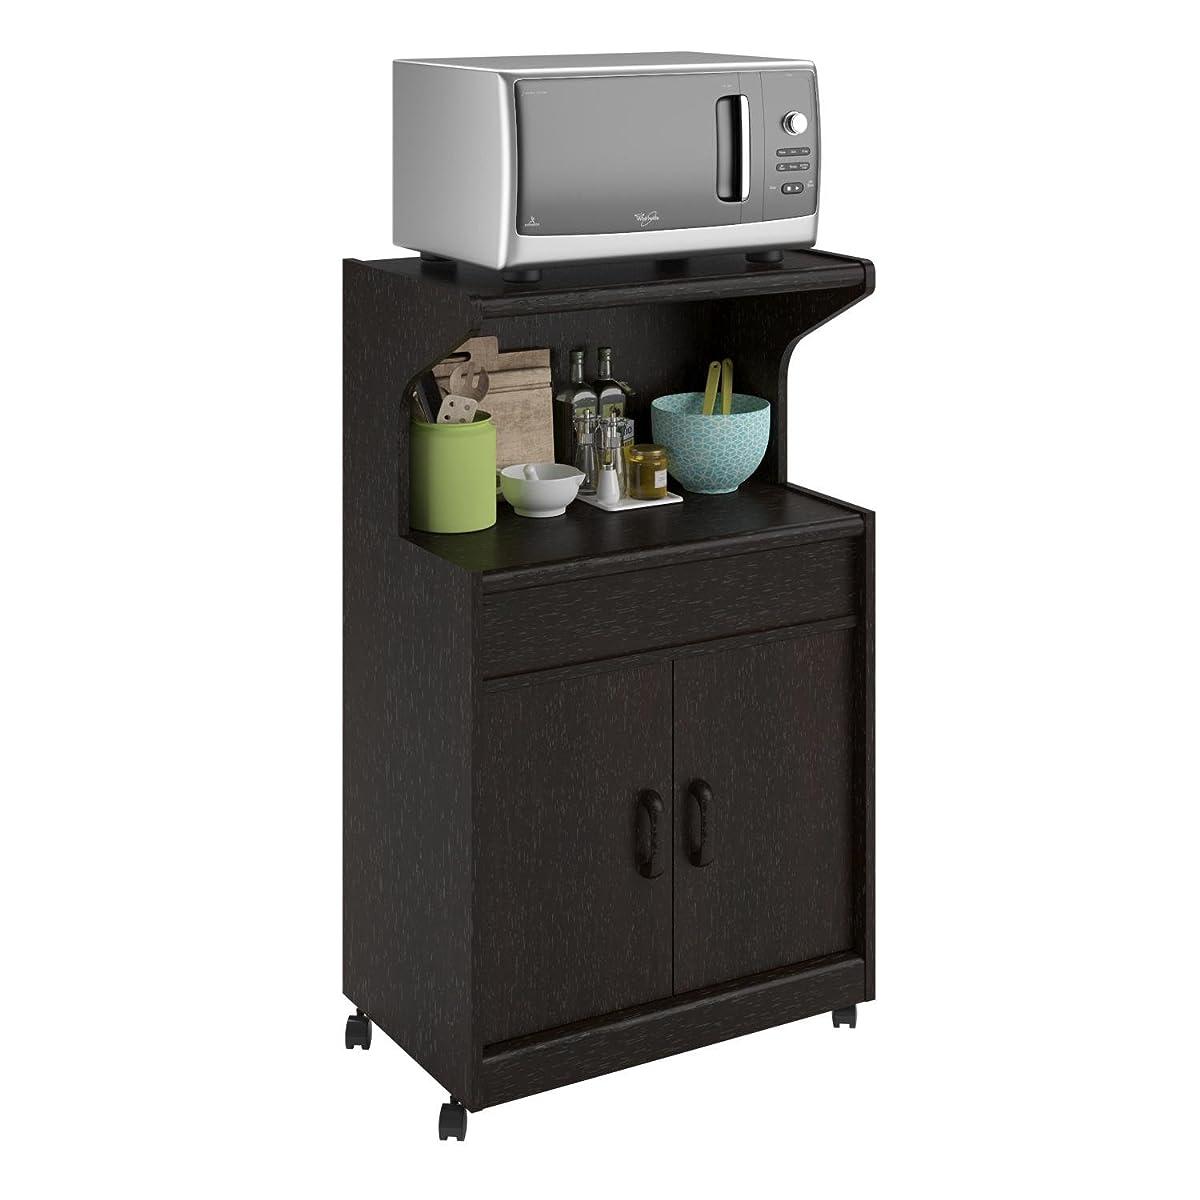 Ameriwood Home Reggie Microwave Cart with Shelf, Espresso